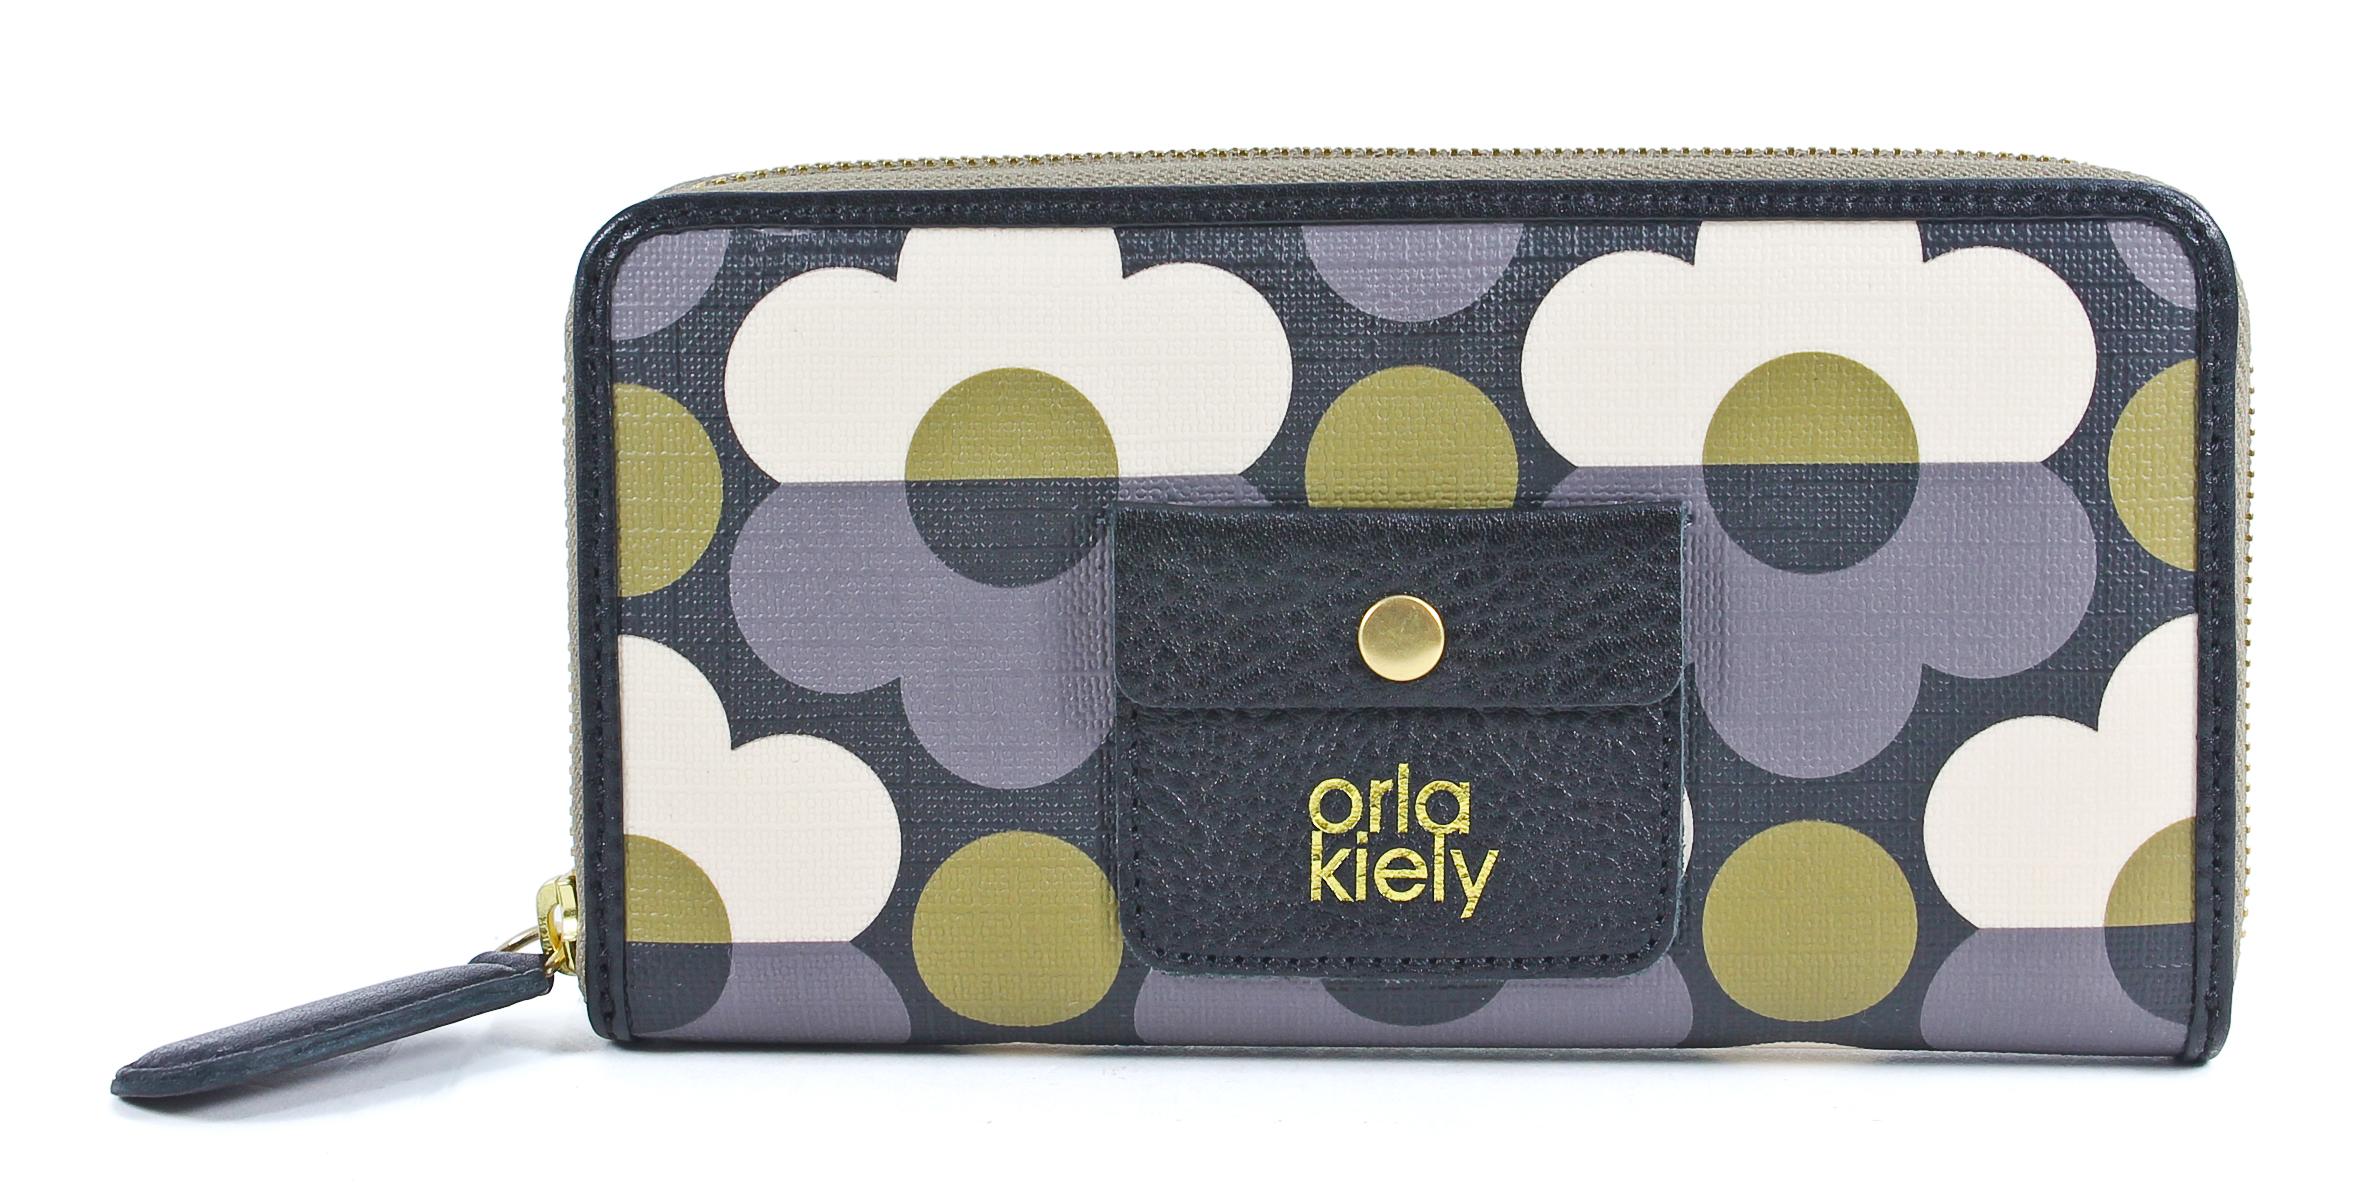 burberry handbags outlet sale  merchandise